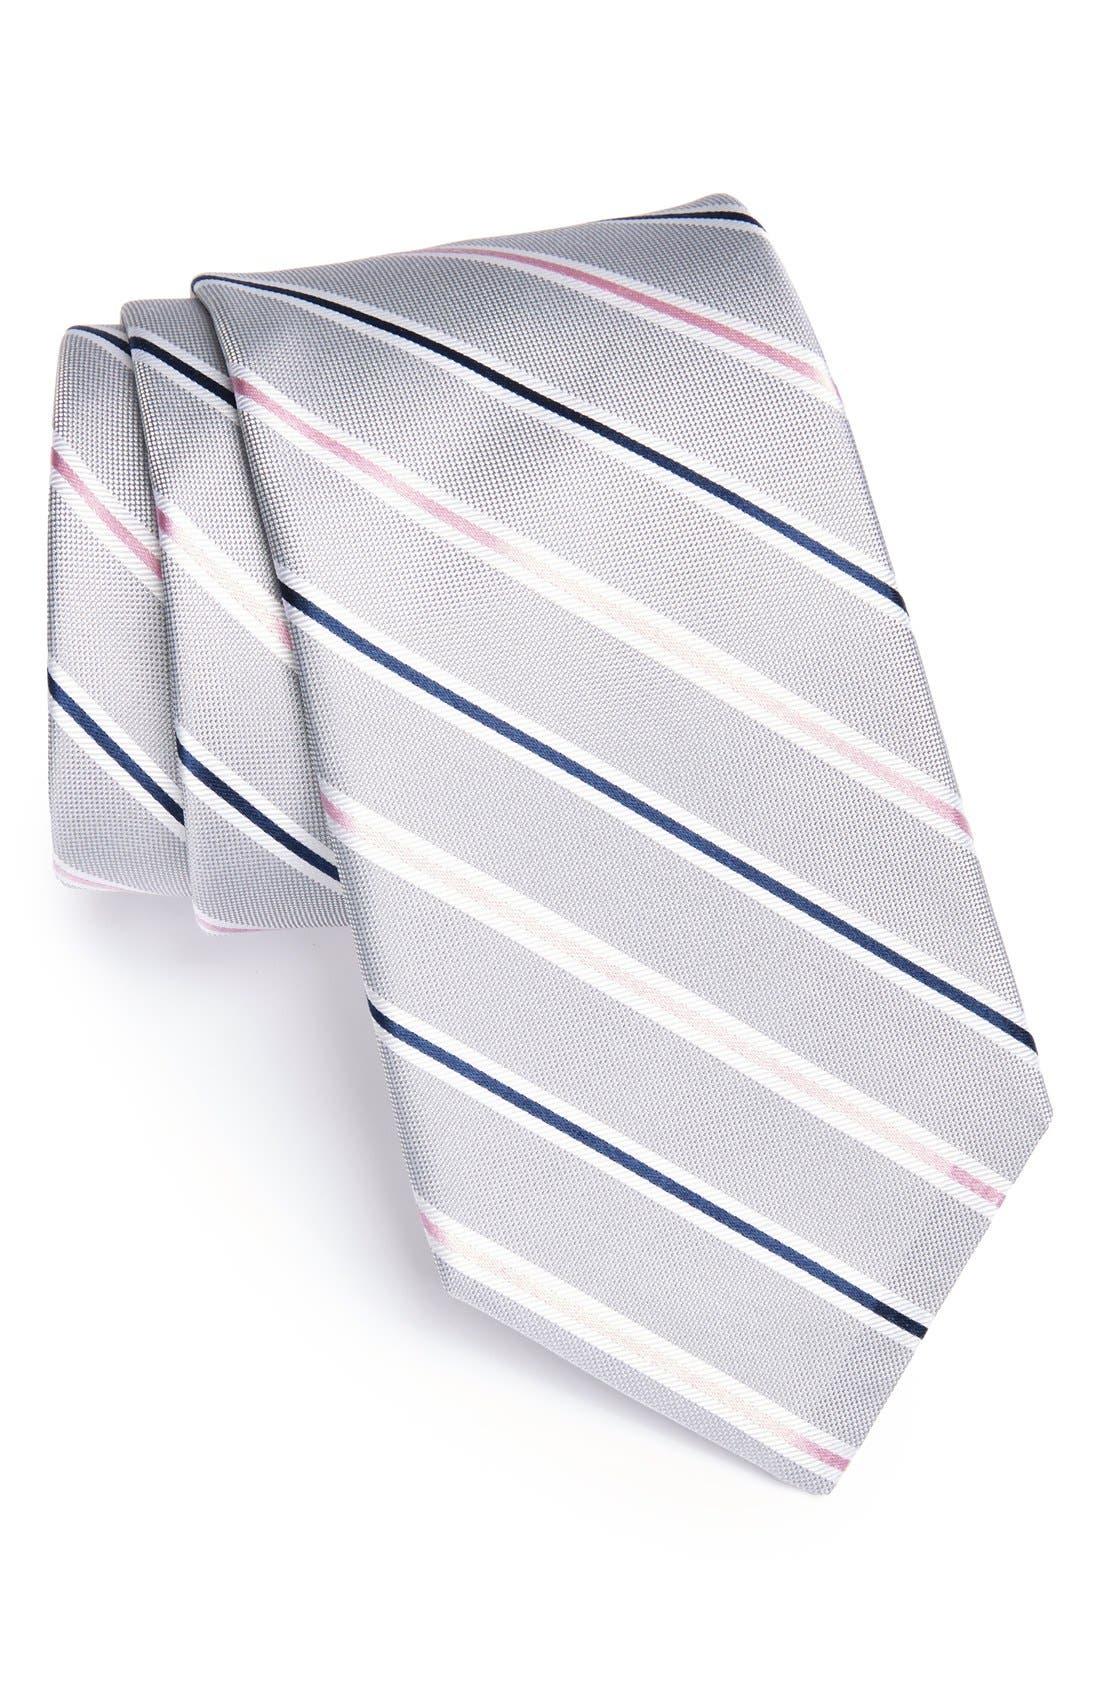 Main Image - Michael Kors Woven Silk Tie (X-Long)